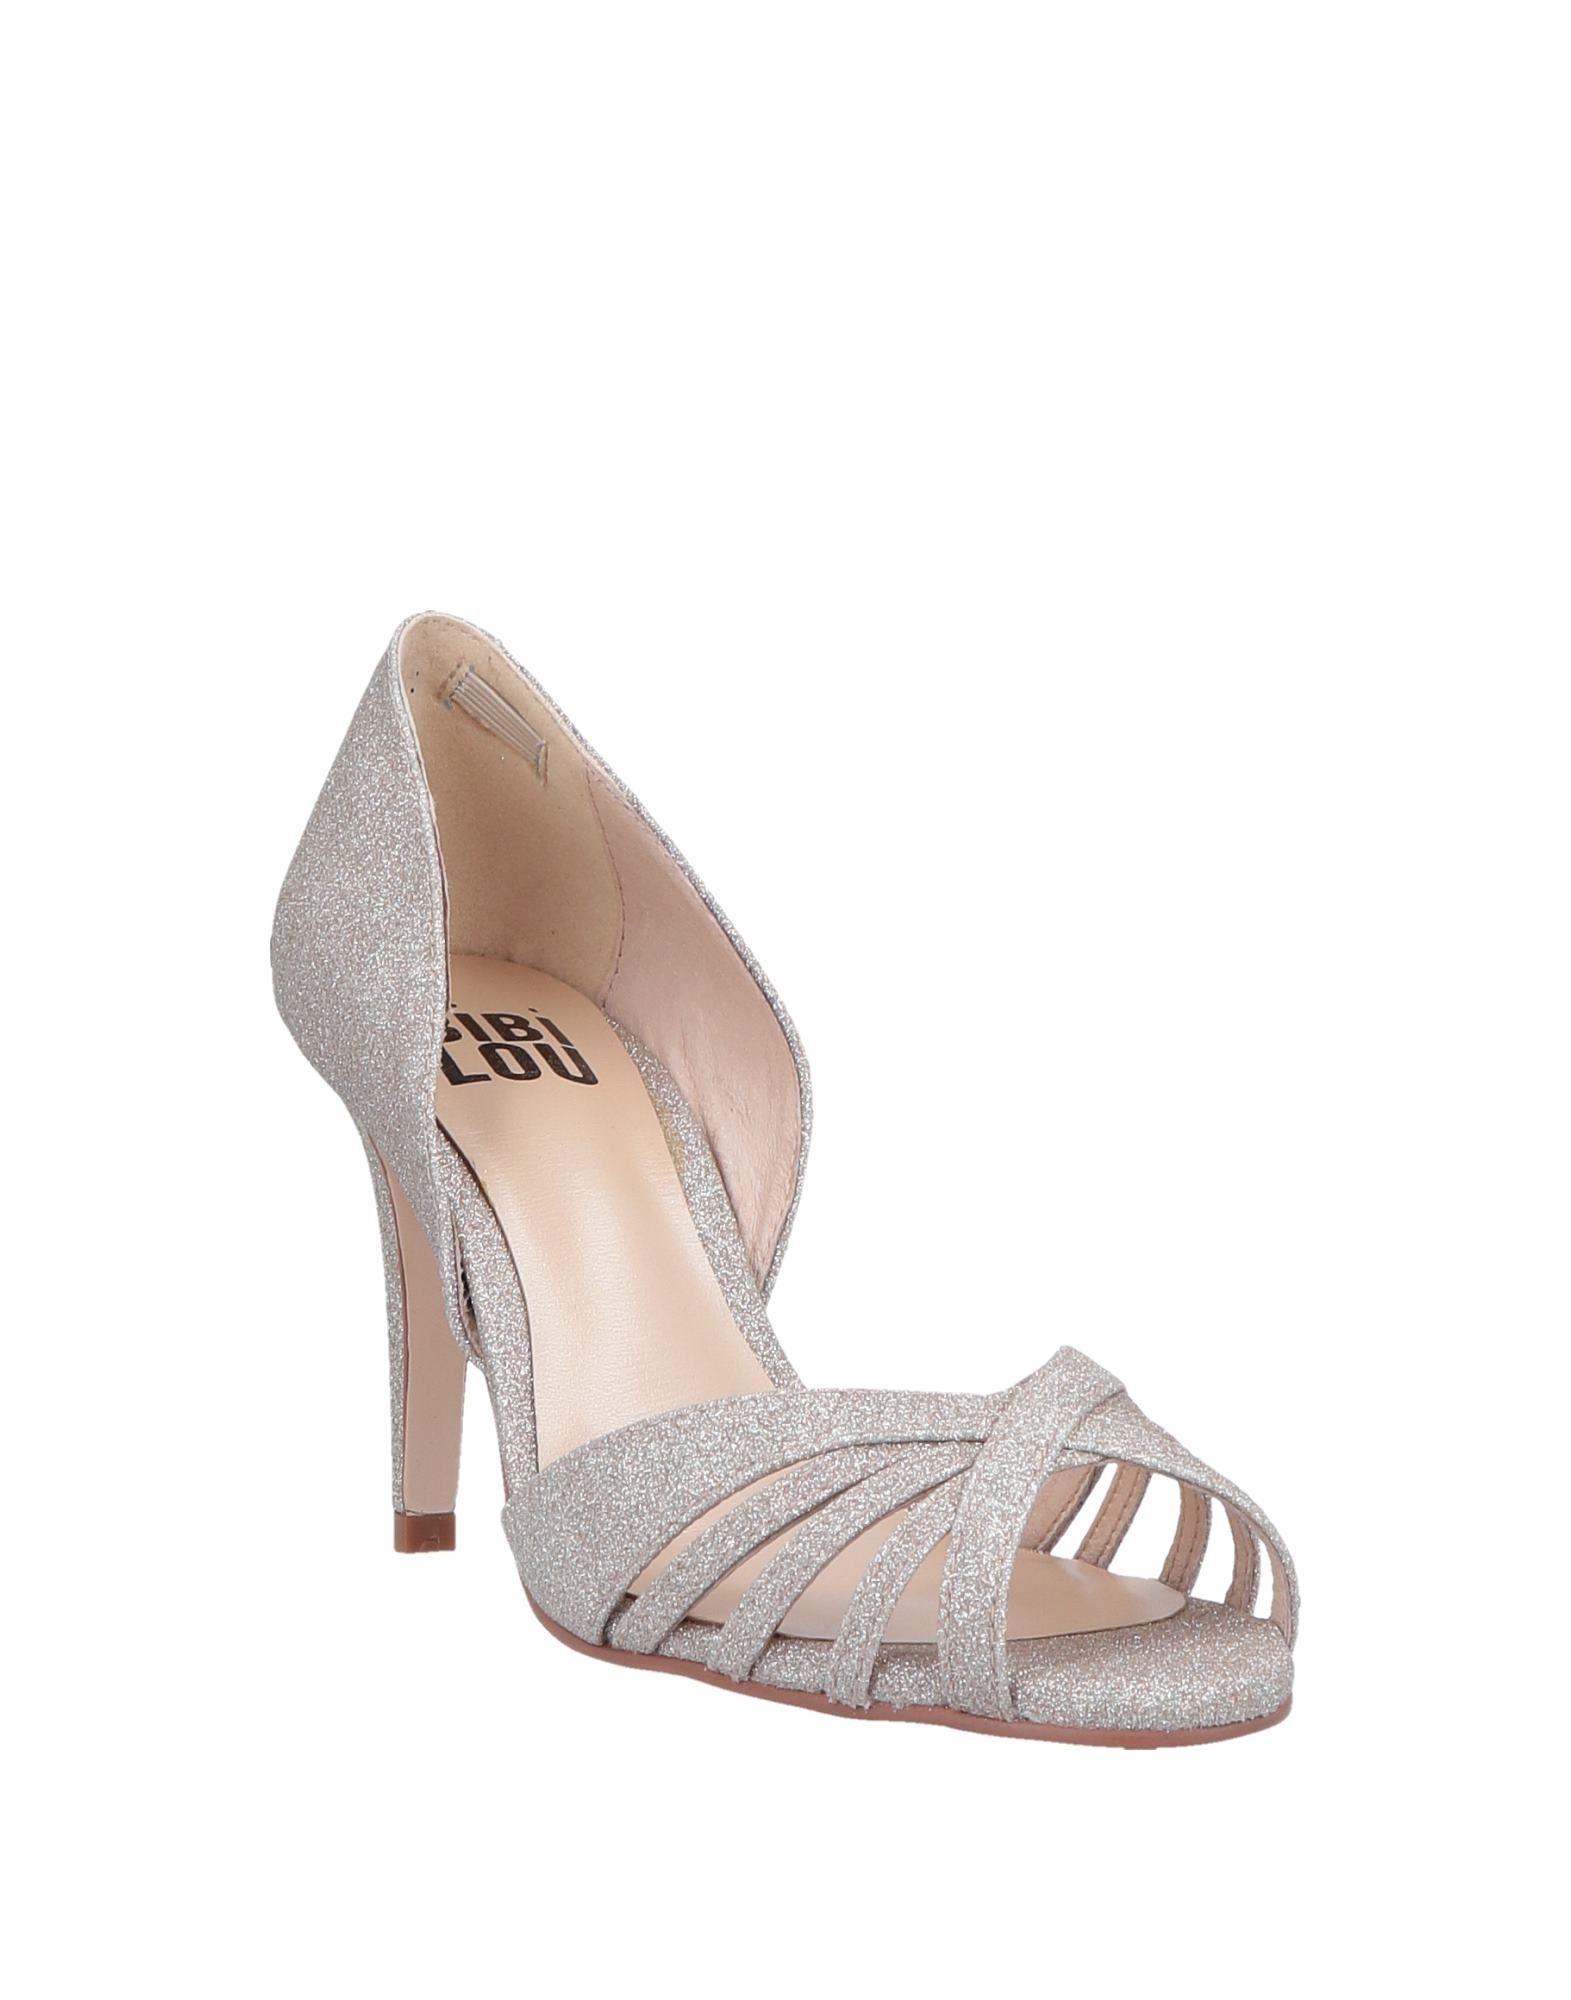 Bibi Lou Platinum Heels